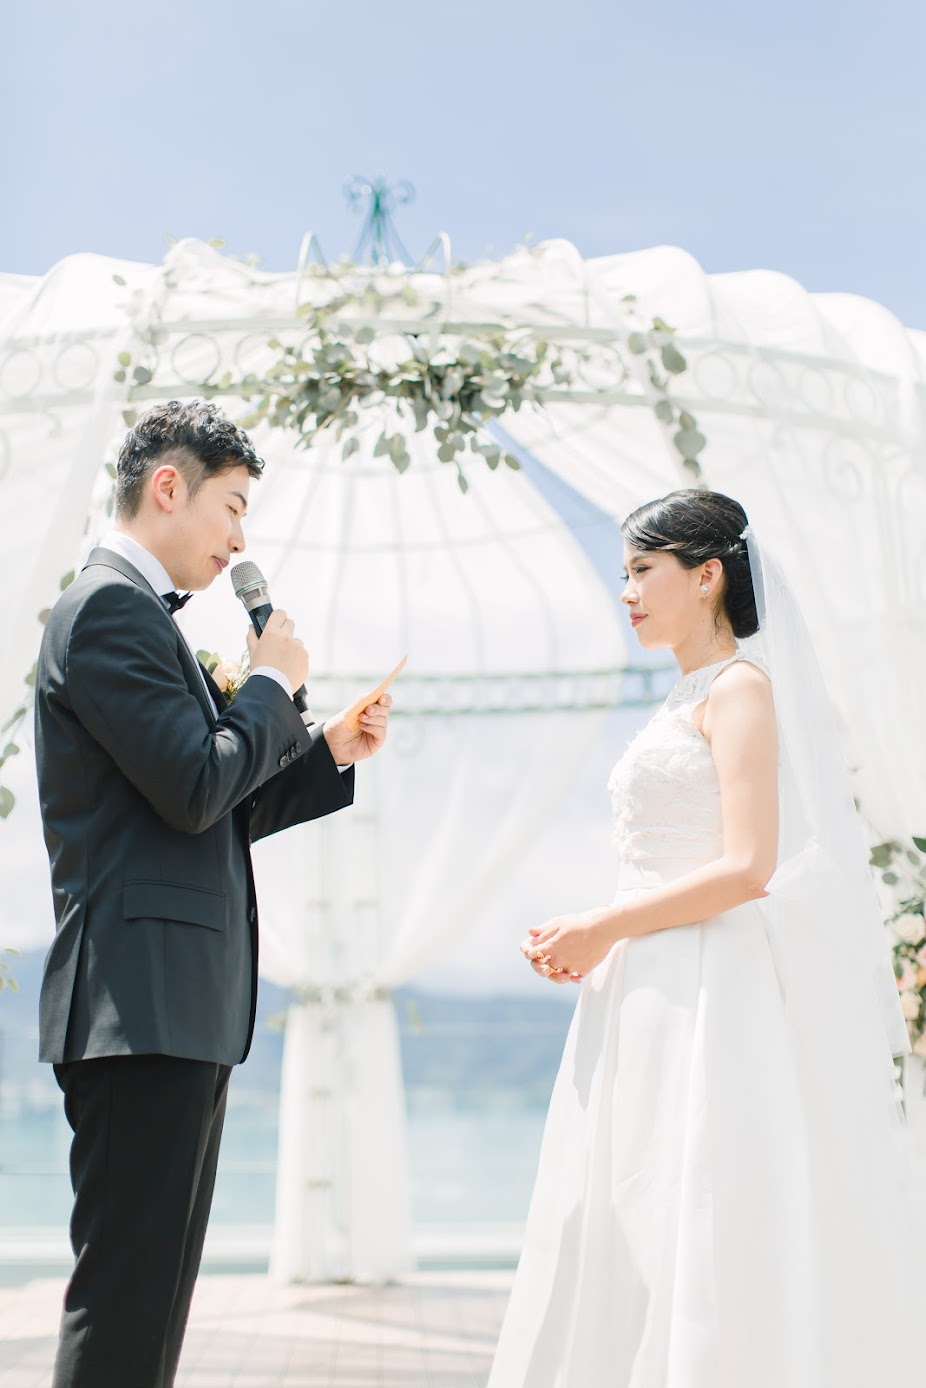 undefineda在 台南 的 日月潭雲品 場地舉行陽光正好的美式婚禮 , 是每位新娘夢寐以求的西式戶外婚禮樣式!